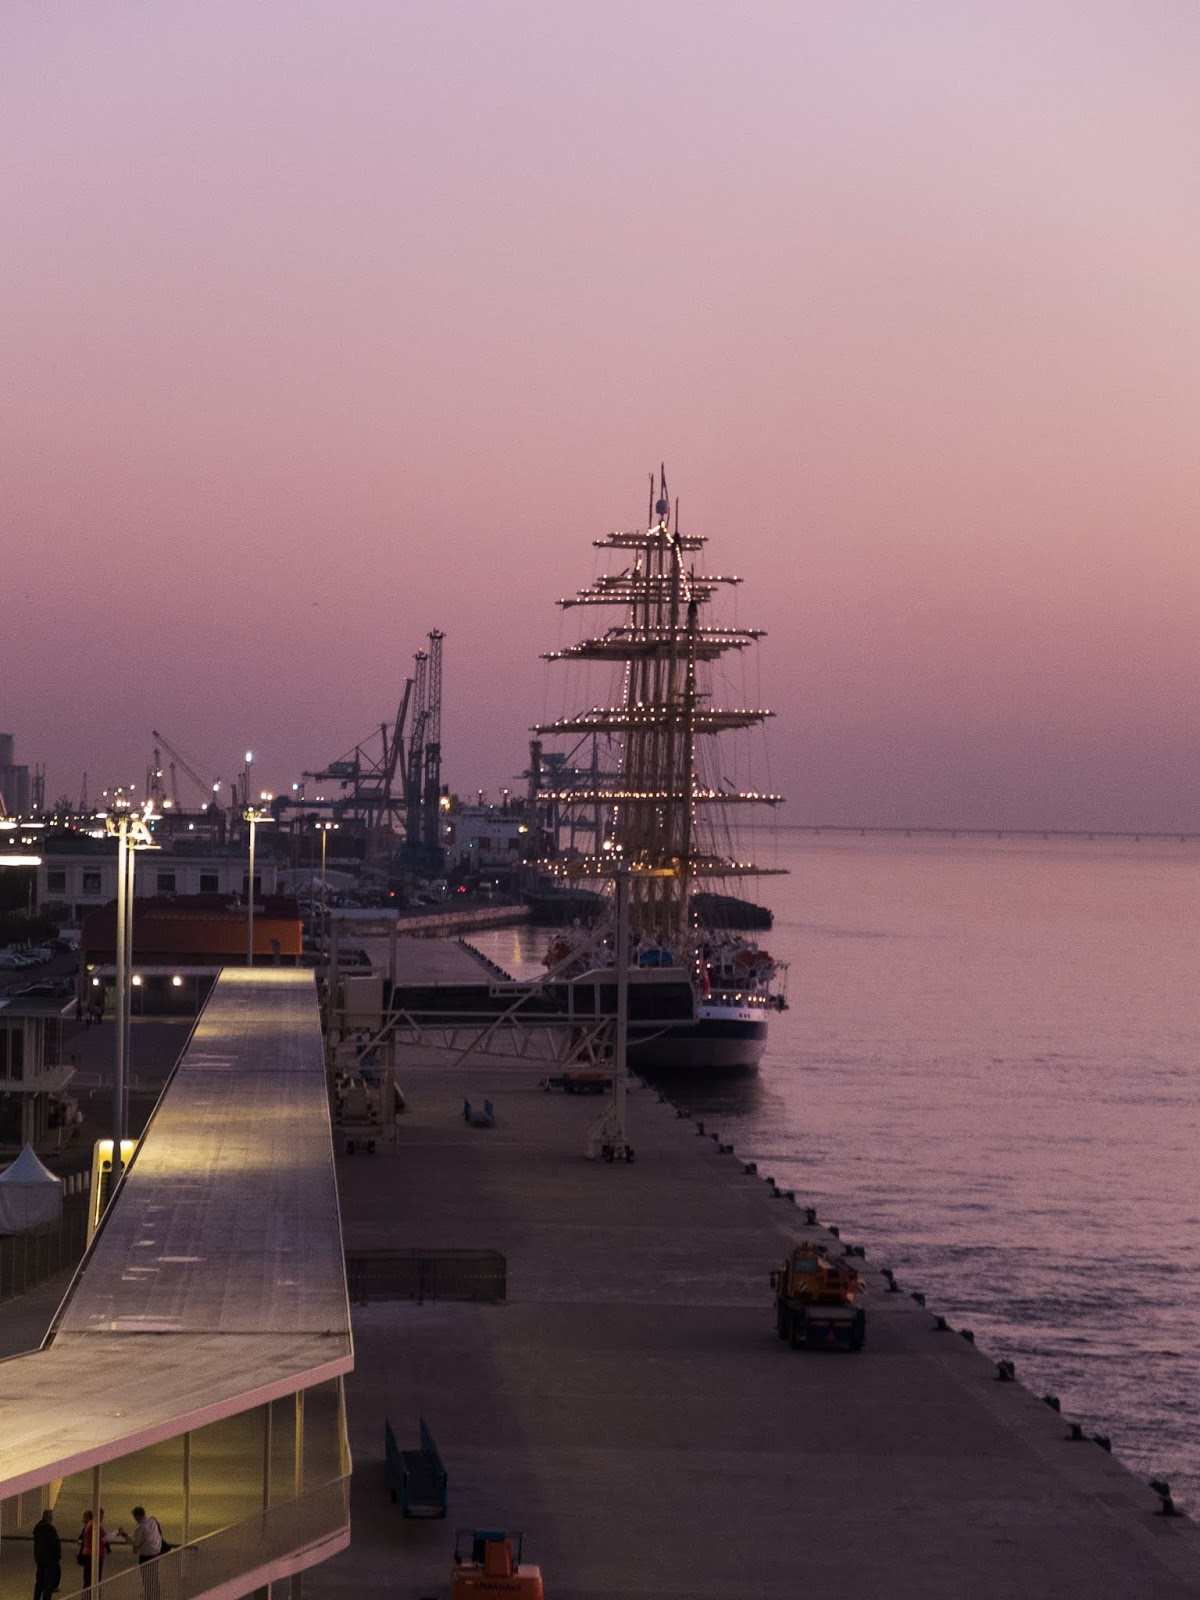 A ship docked at the port of Lisbon captured at sunrise.